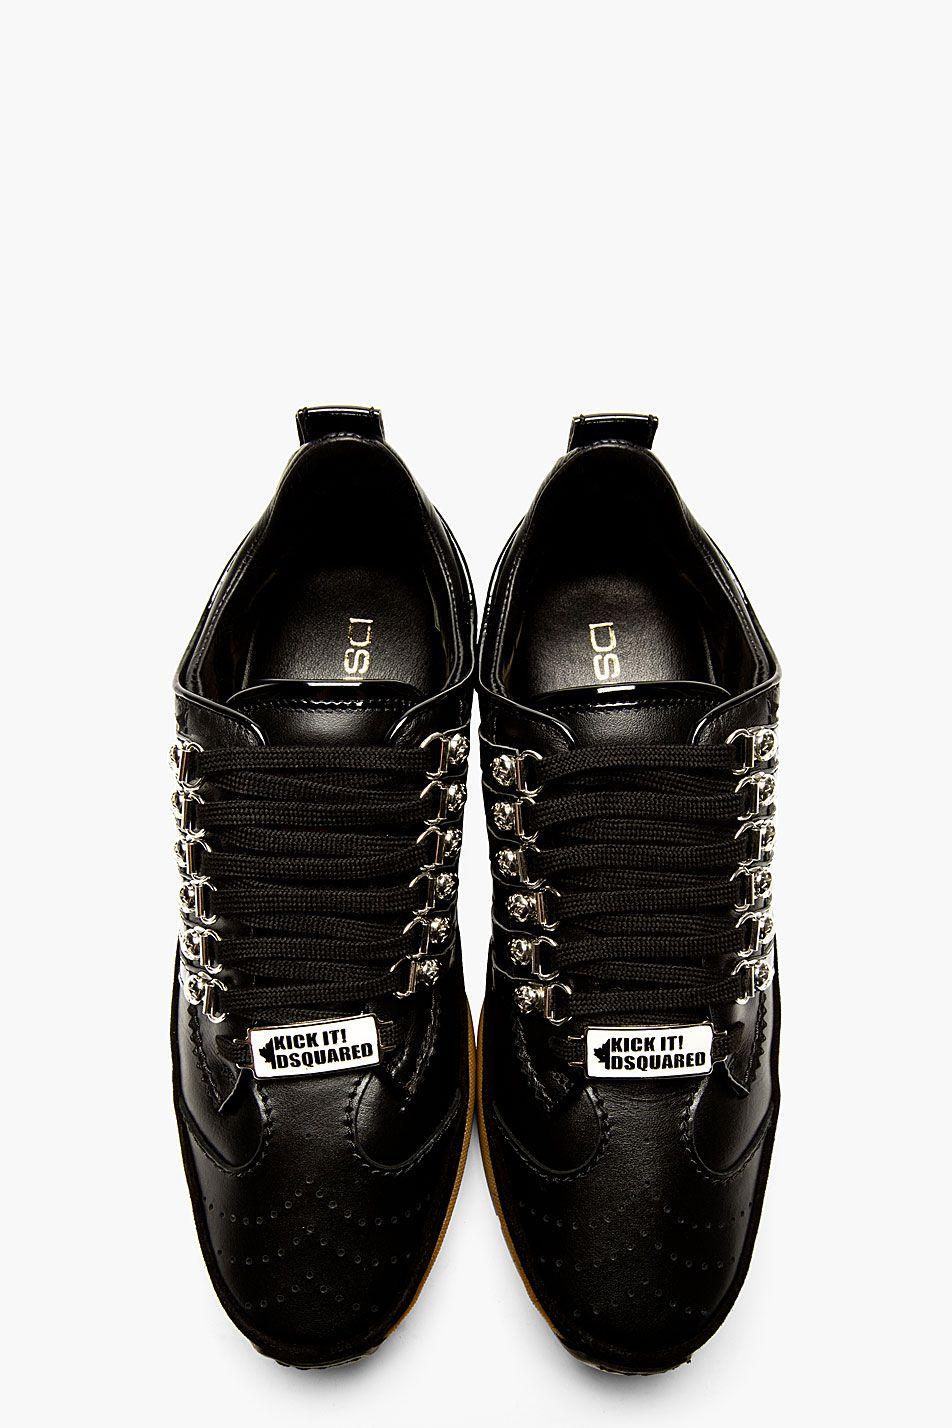 Sneakers   Dsquared2, Kicks